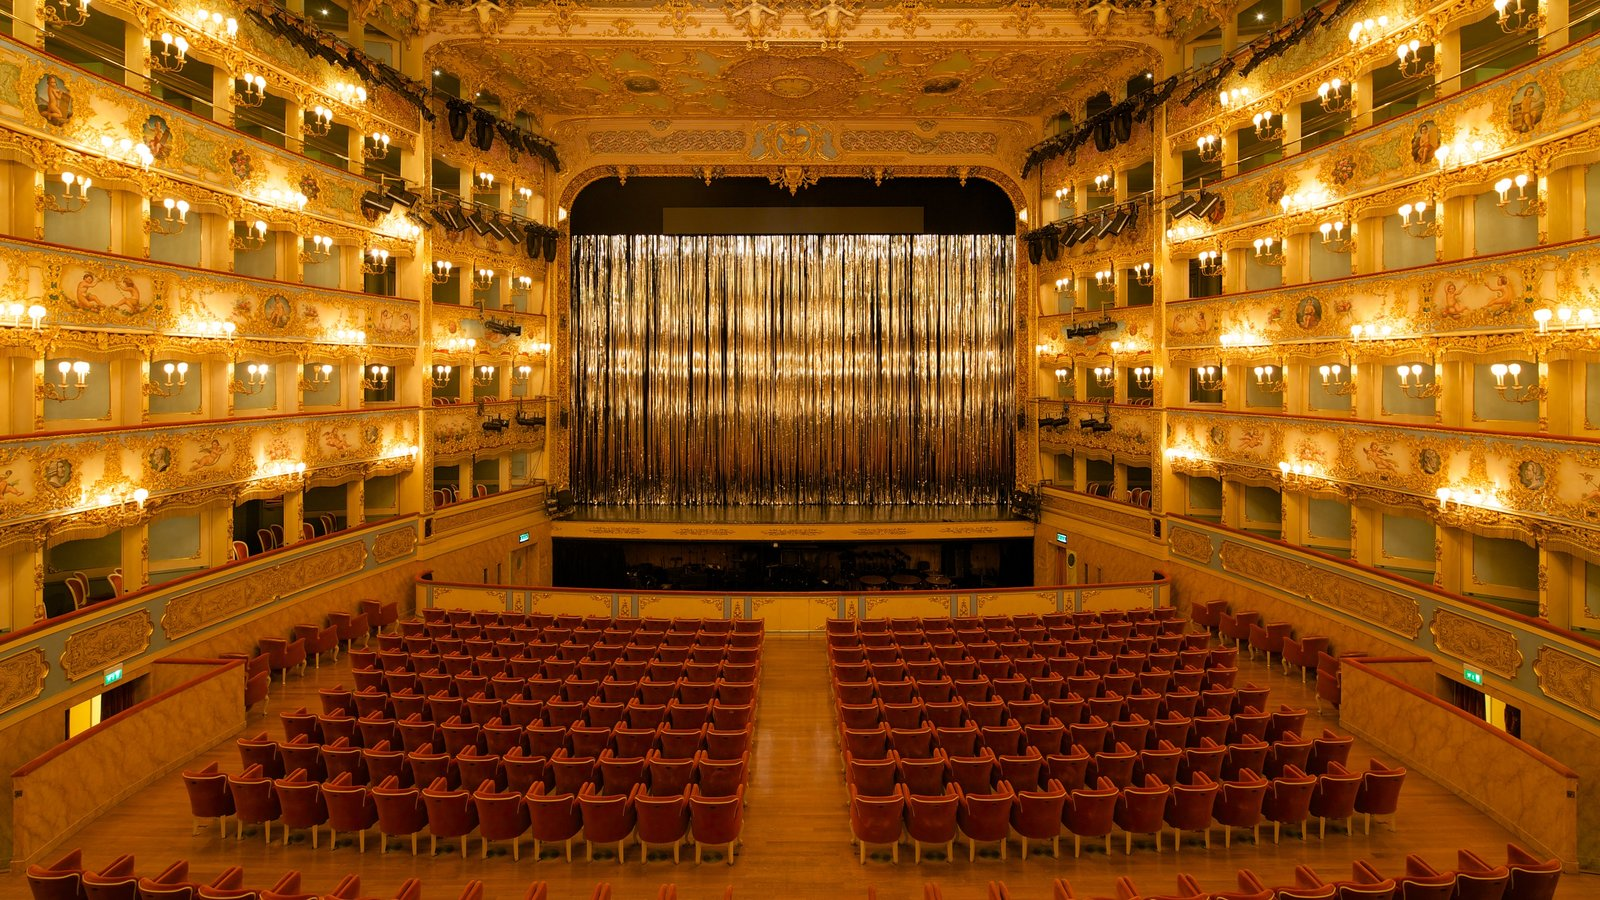 La Fenice Opera House which includes interior views and theater scenes